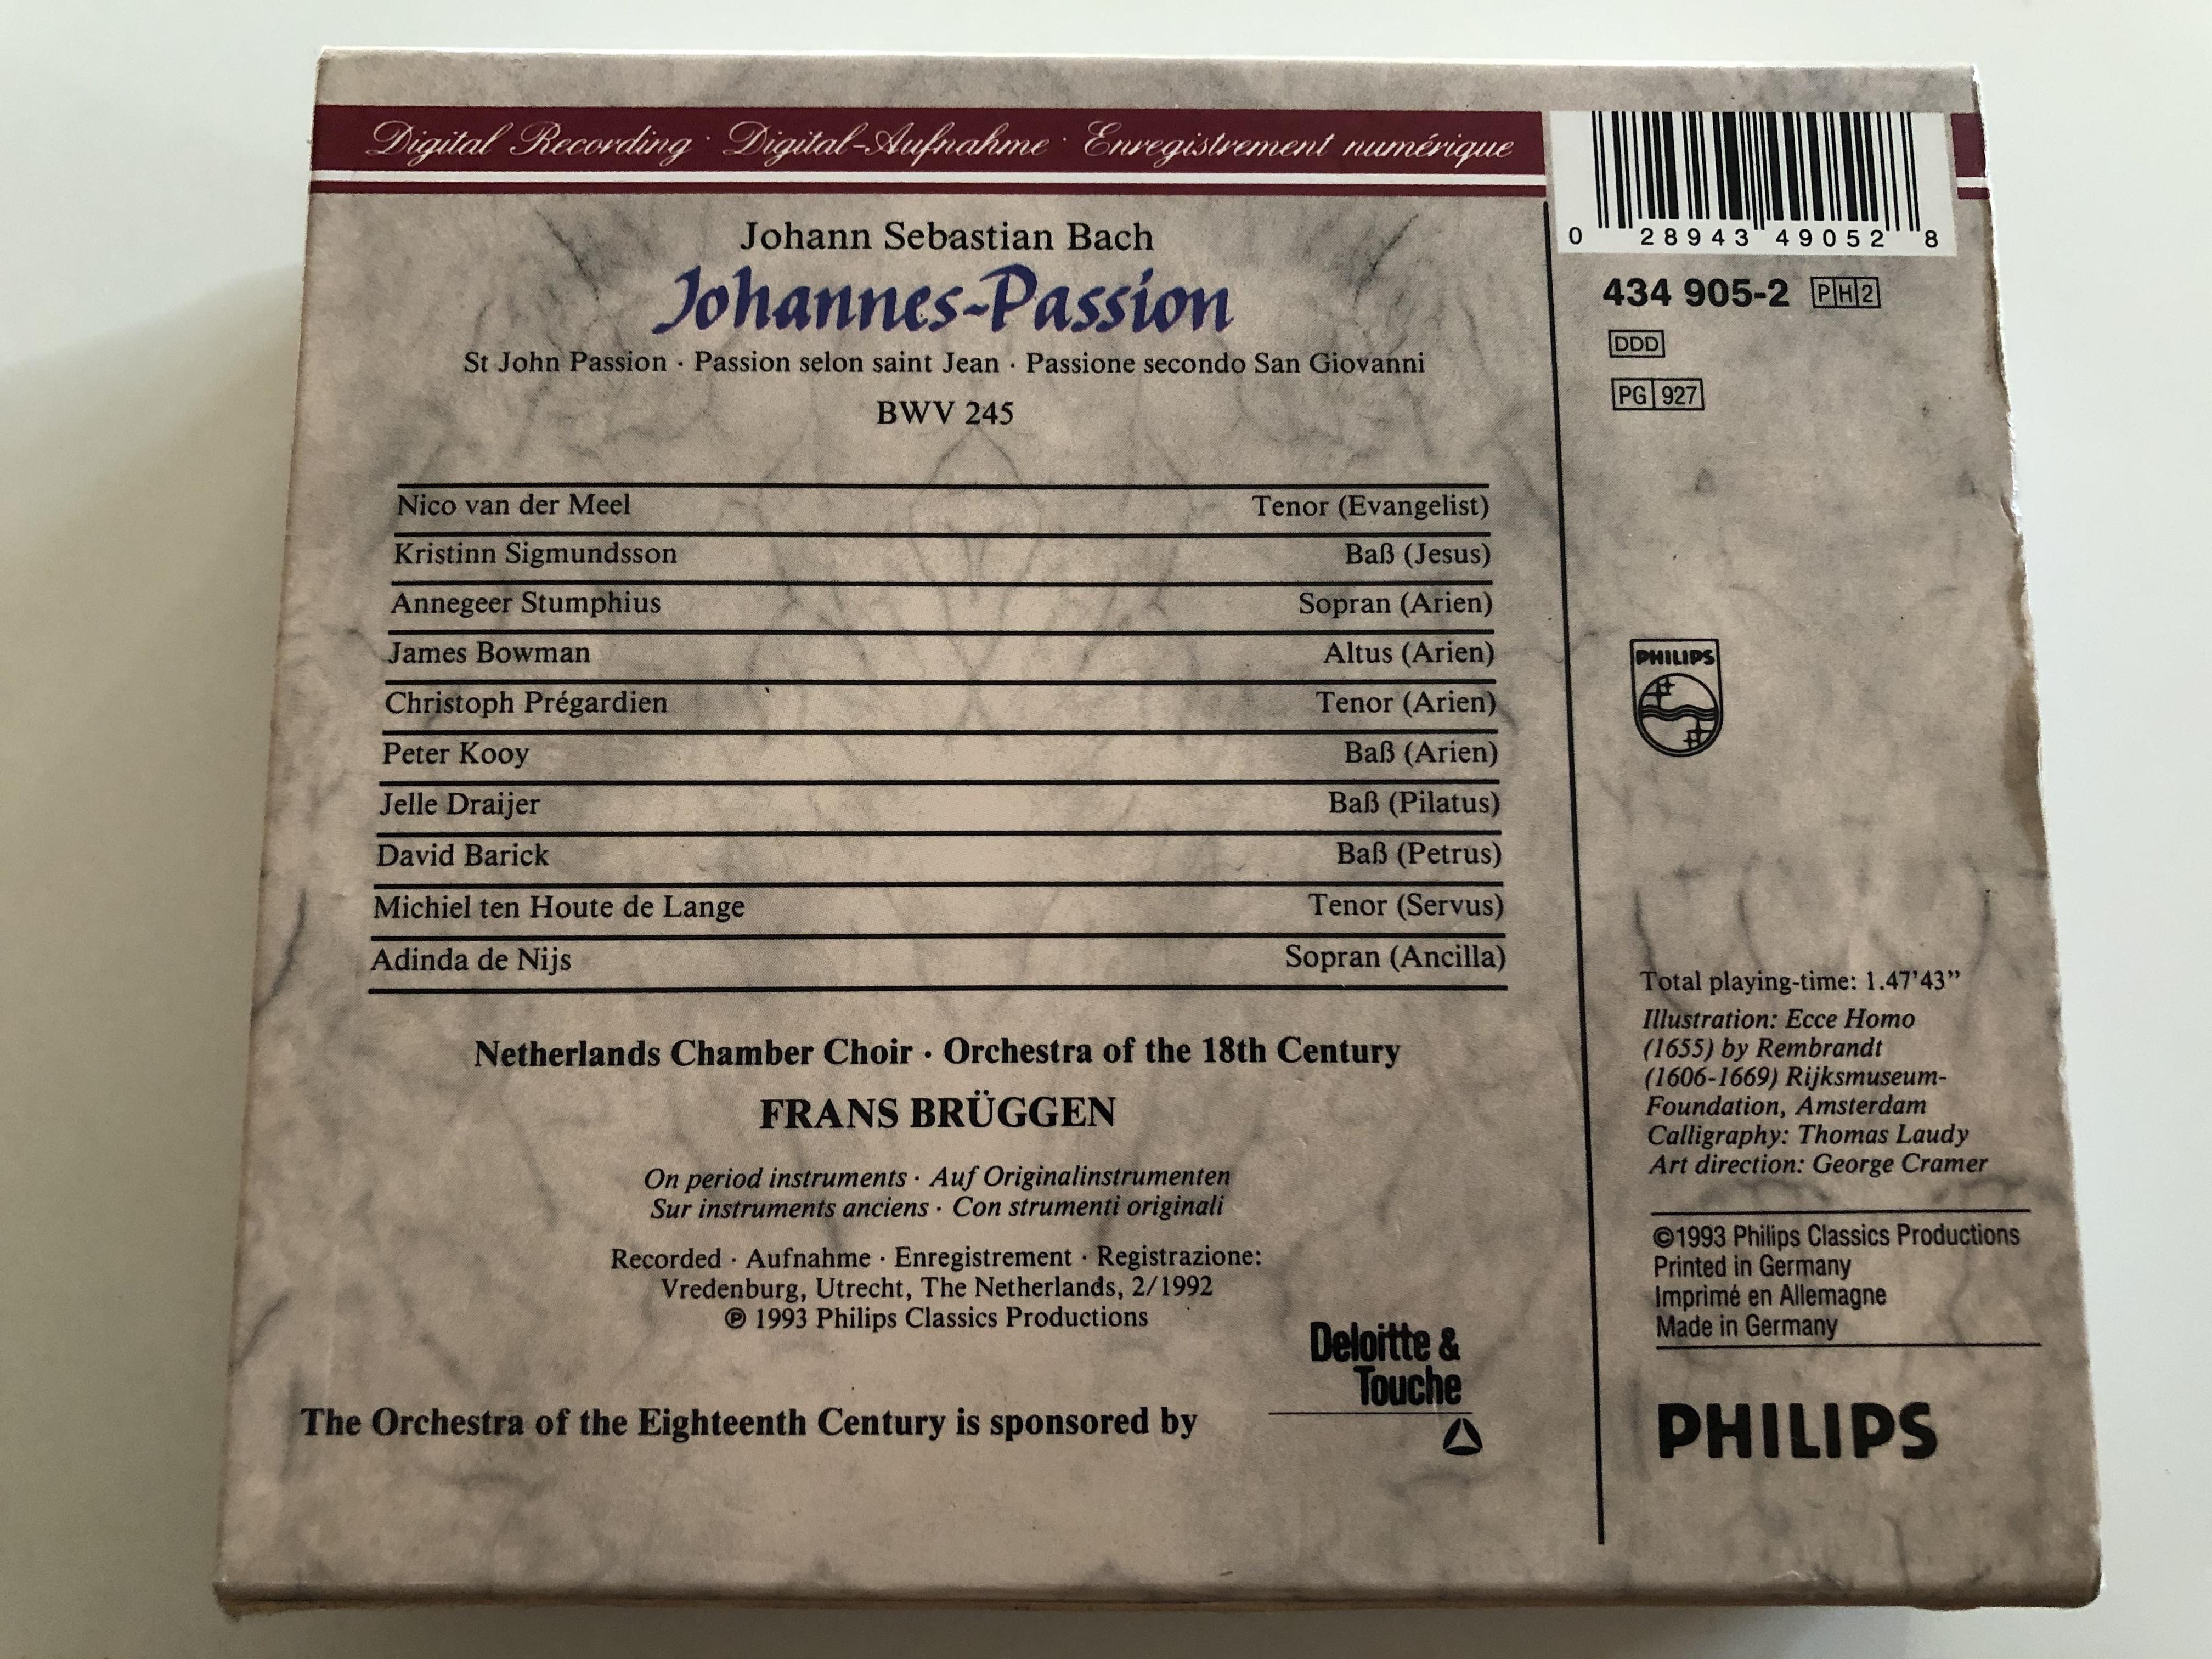 bach-johannes-passion-st-john-passion-passion-selon-saint-jean-stumphius-bowman-van-der-meel-pregardien-sigmundsson-kooy-netherlands-chamber-choir-orchestra-of-the-18th-century-fran-3-.jpg